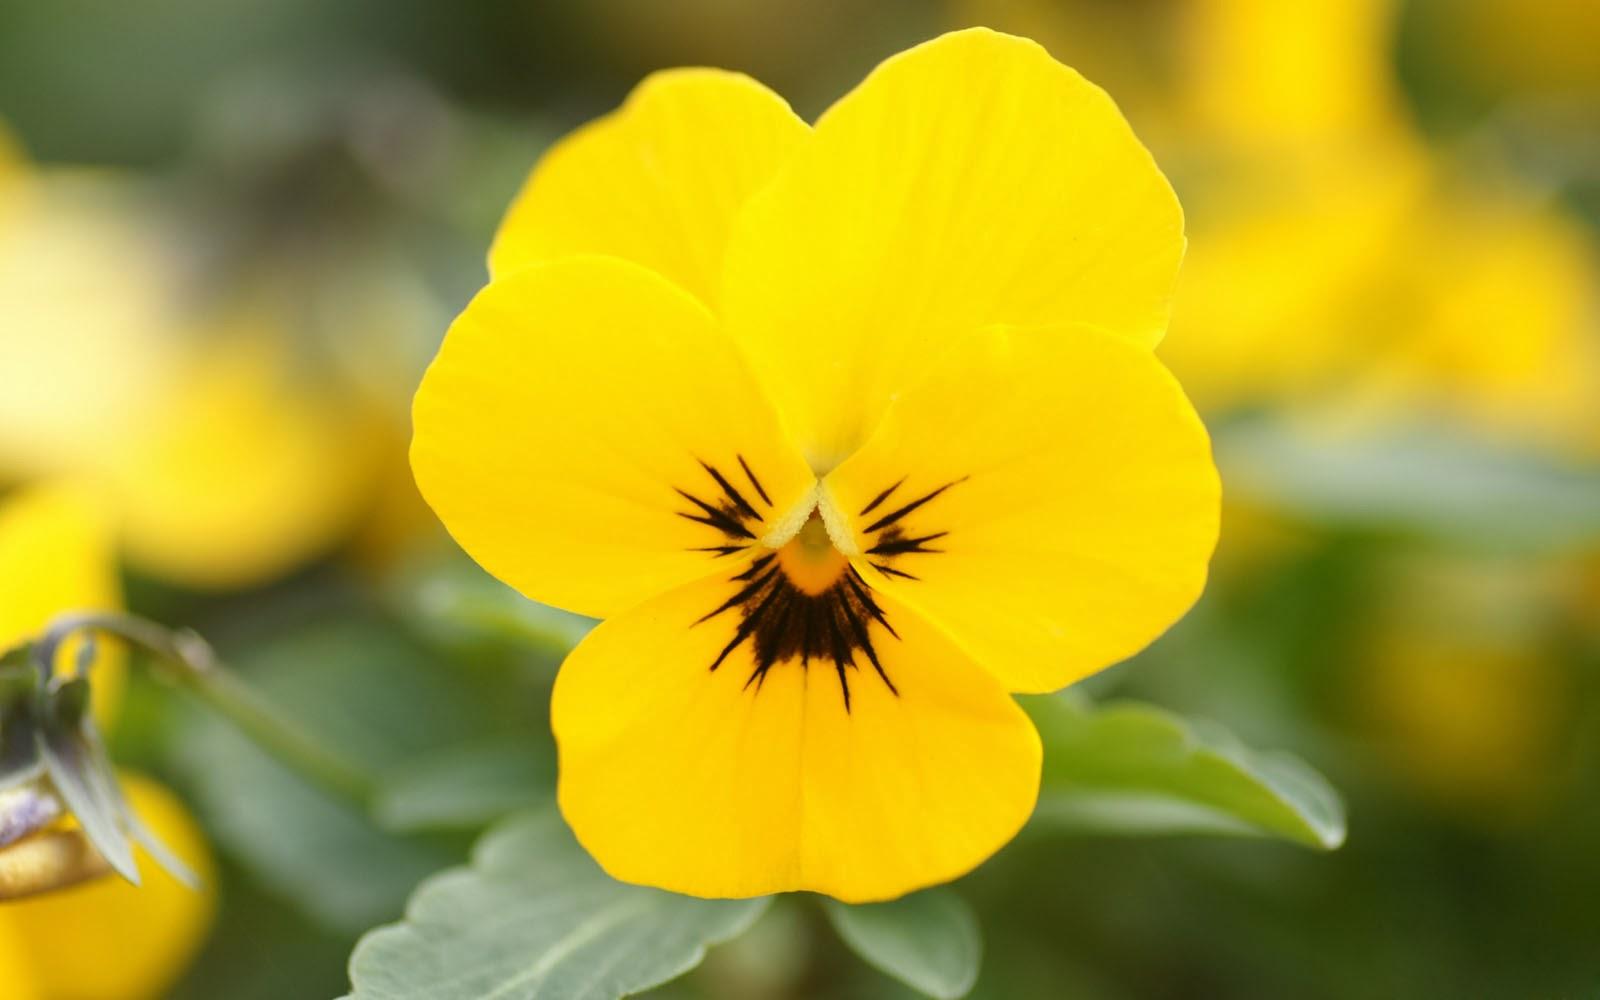 Yellow Pansy Flowers Wallpaper 43224 1600x1000 Px Hdwallsource